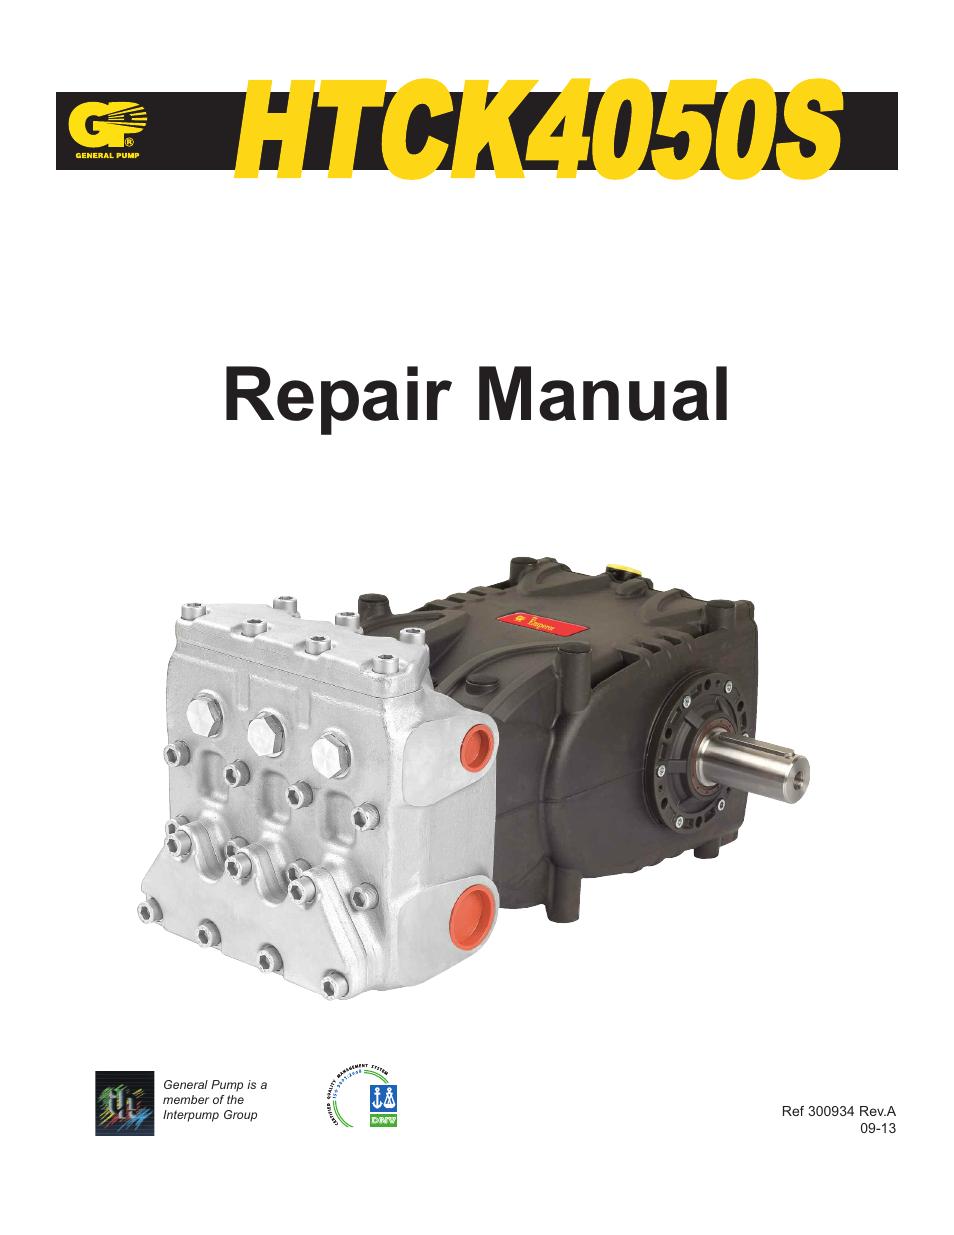 general pump htck4050s user manual 19 pages rh manualsdir com  Operating Tools